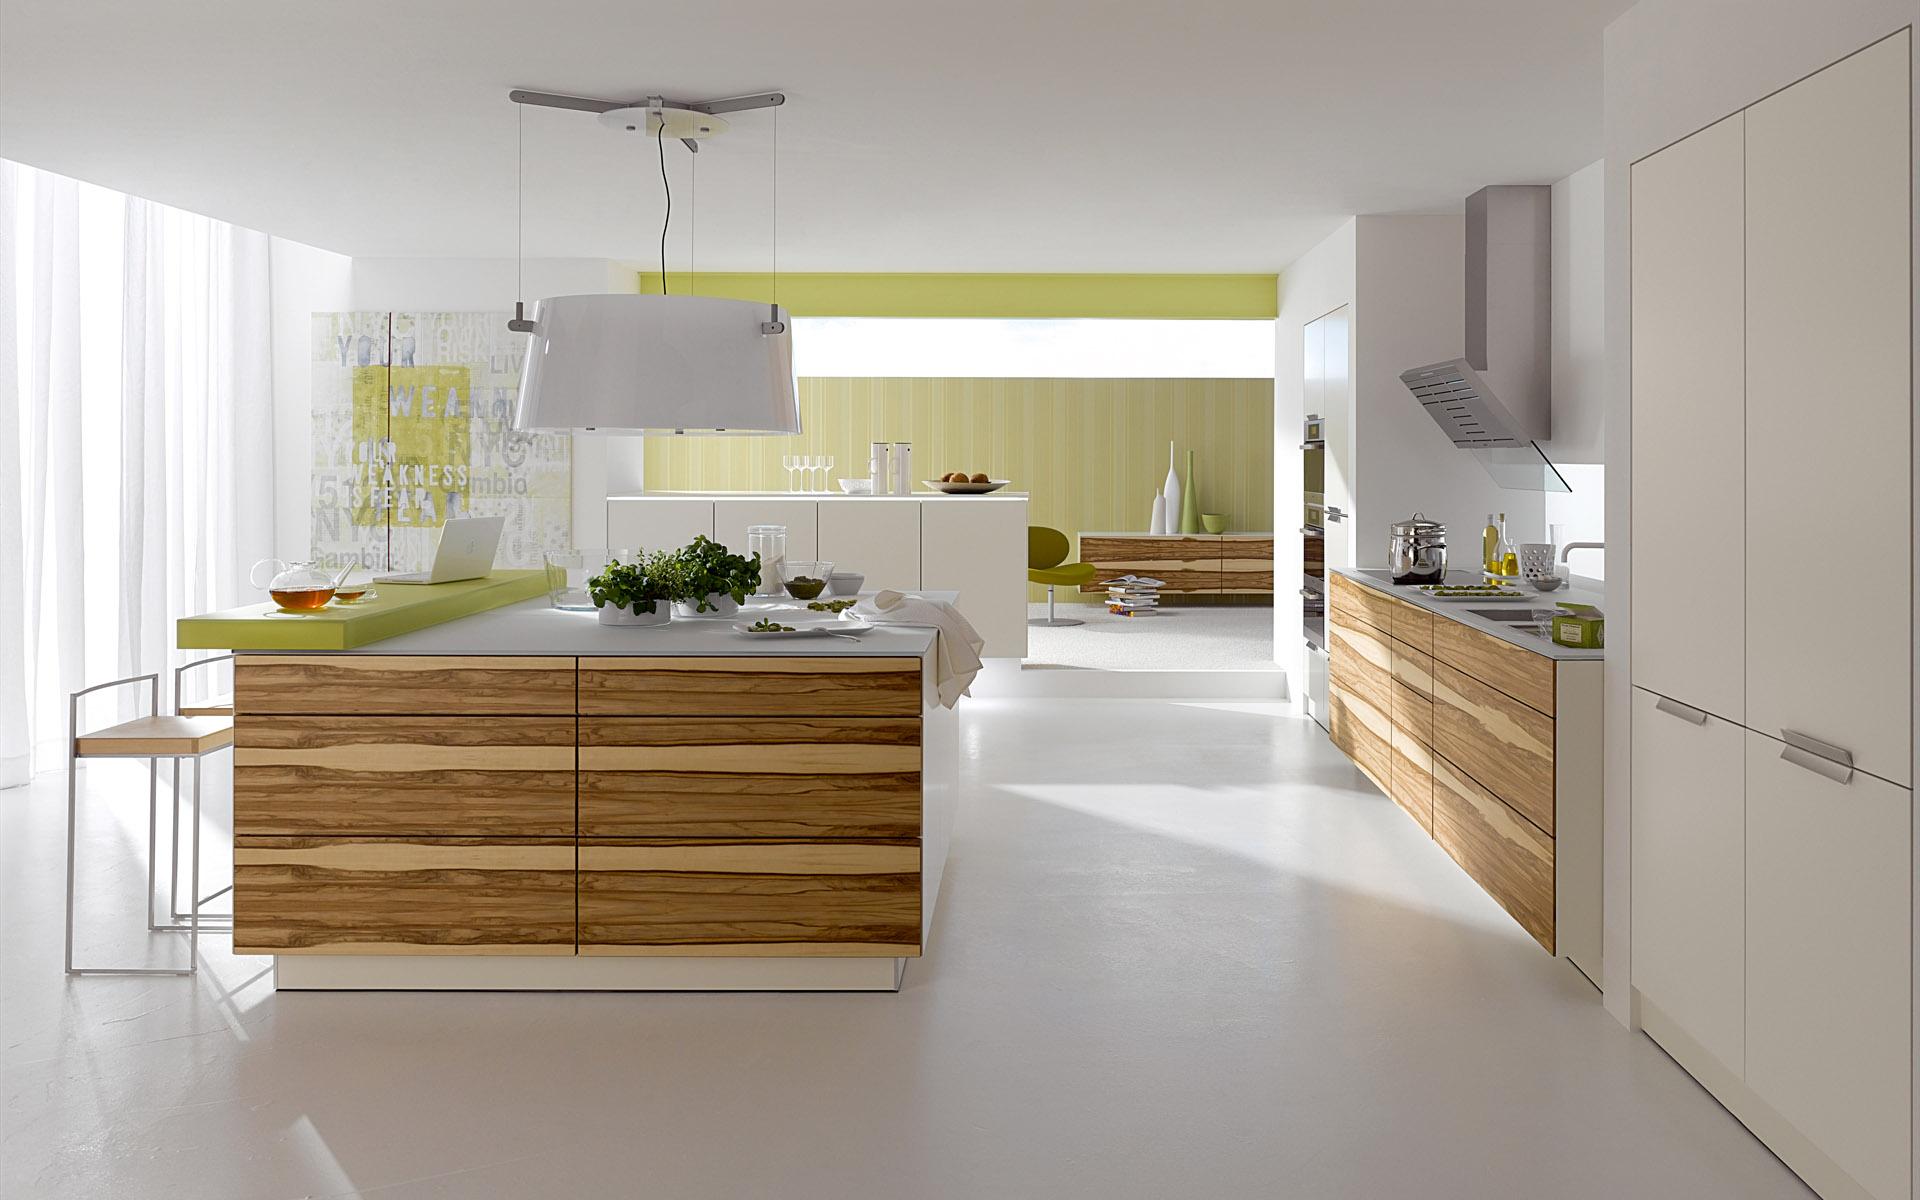 View In Gallery Konsep Moden Menjadikan Dapur Cantik Dan Kemas